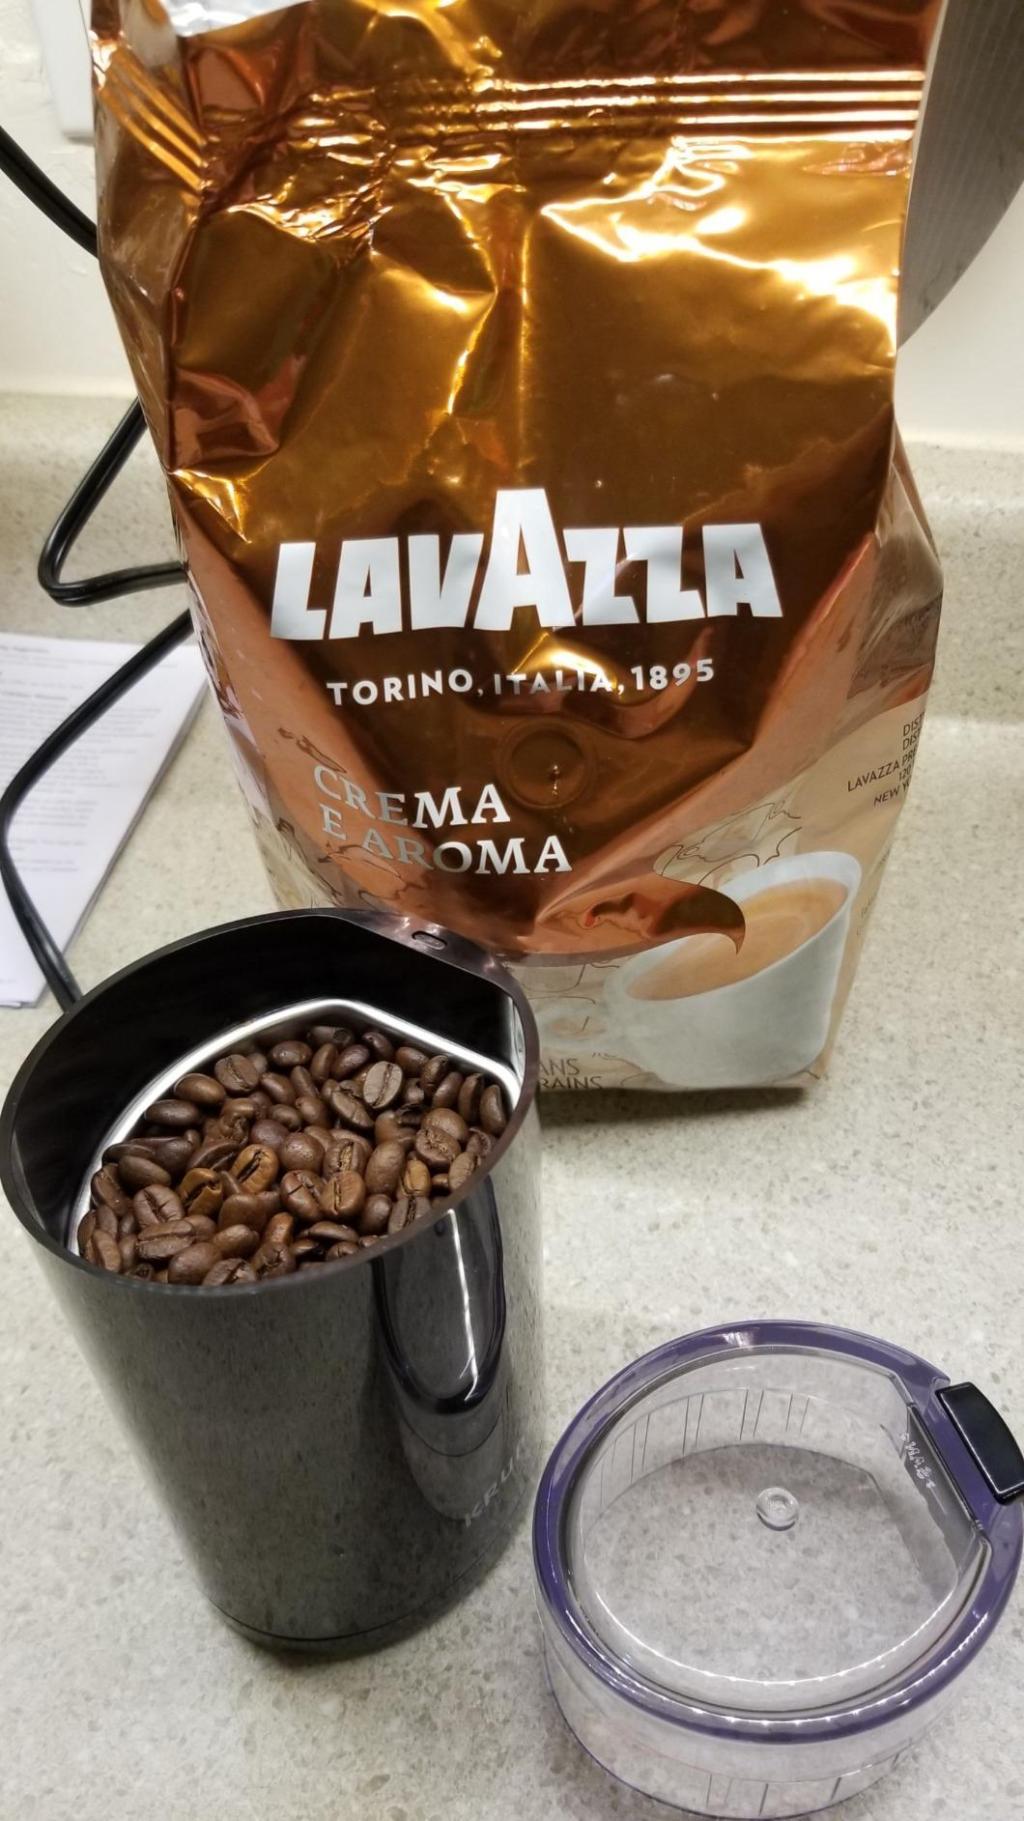 Lavazza Crema E Aroma Bag next to coffee grinder